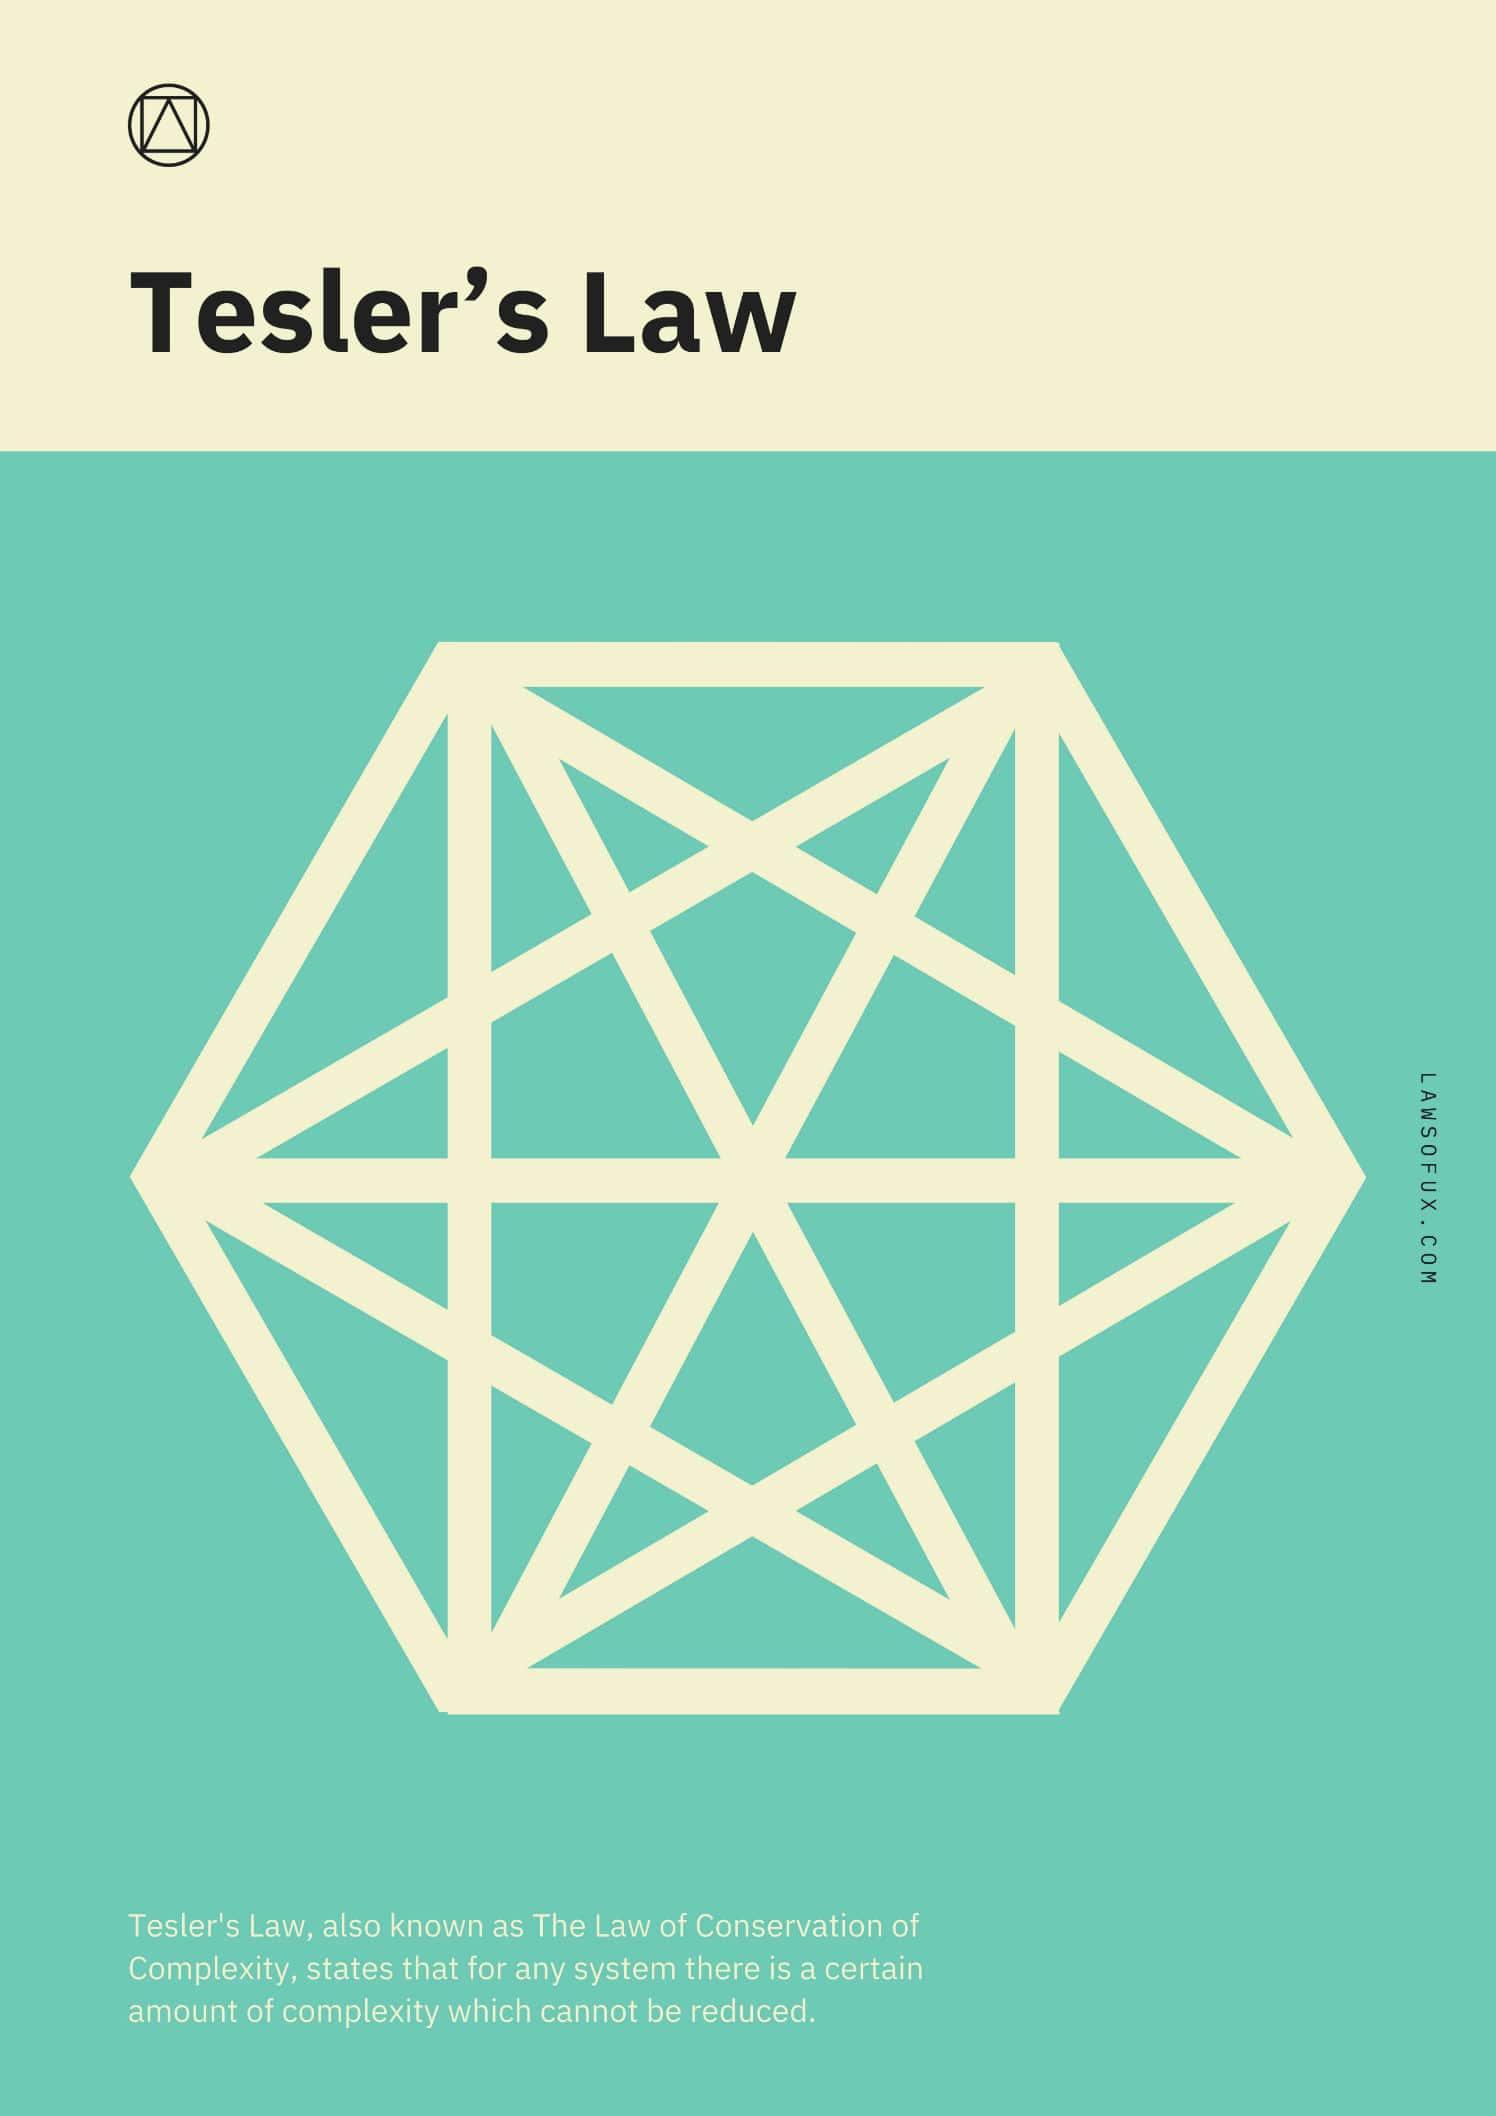 Закон Теслера